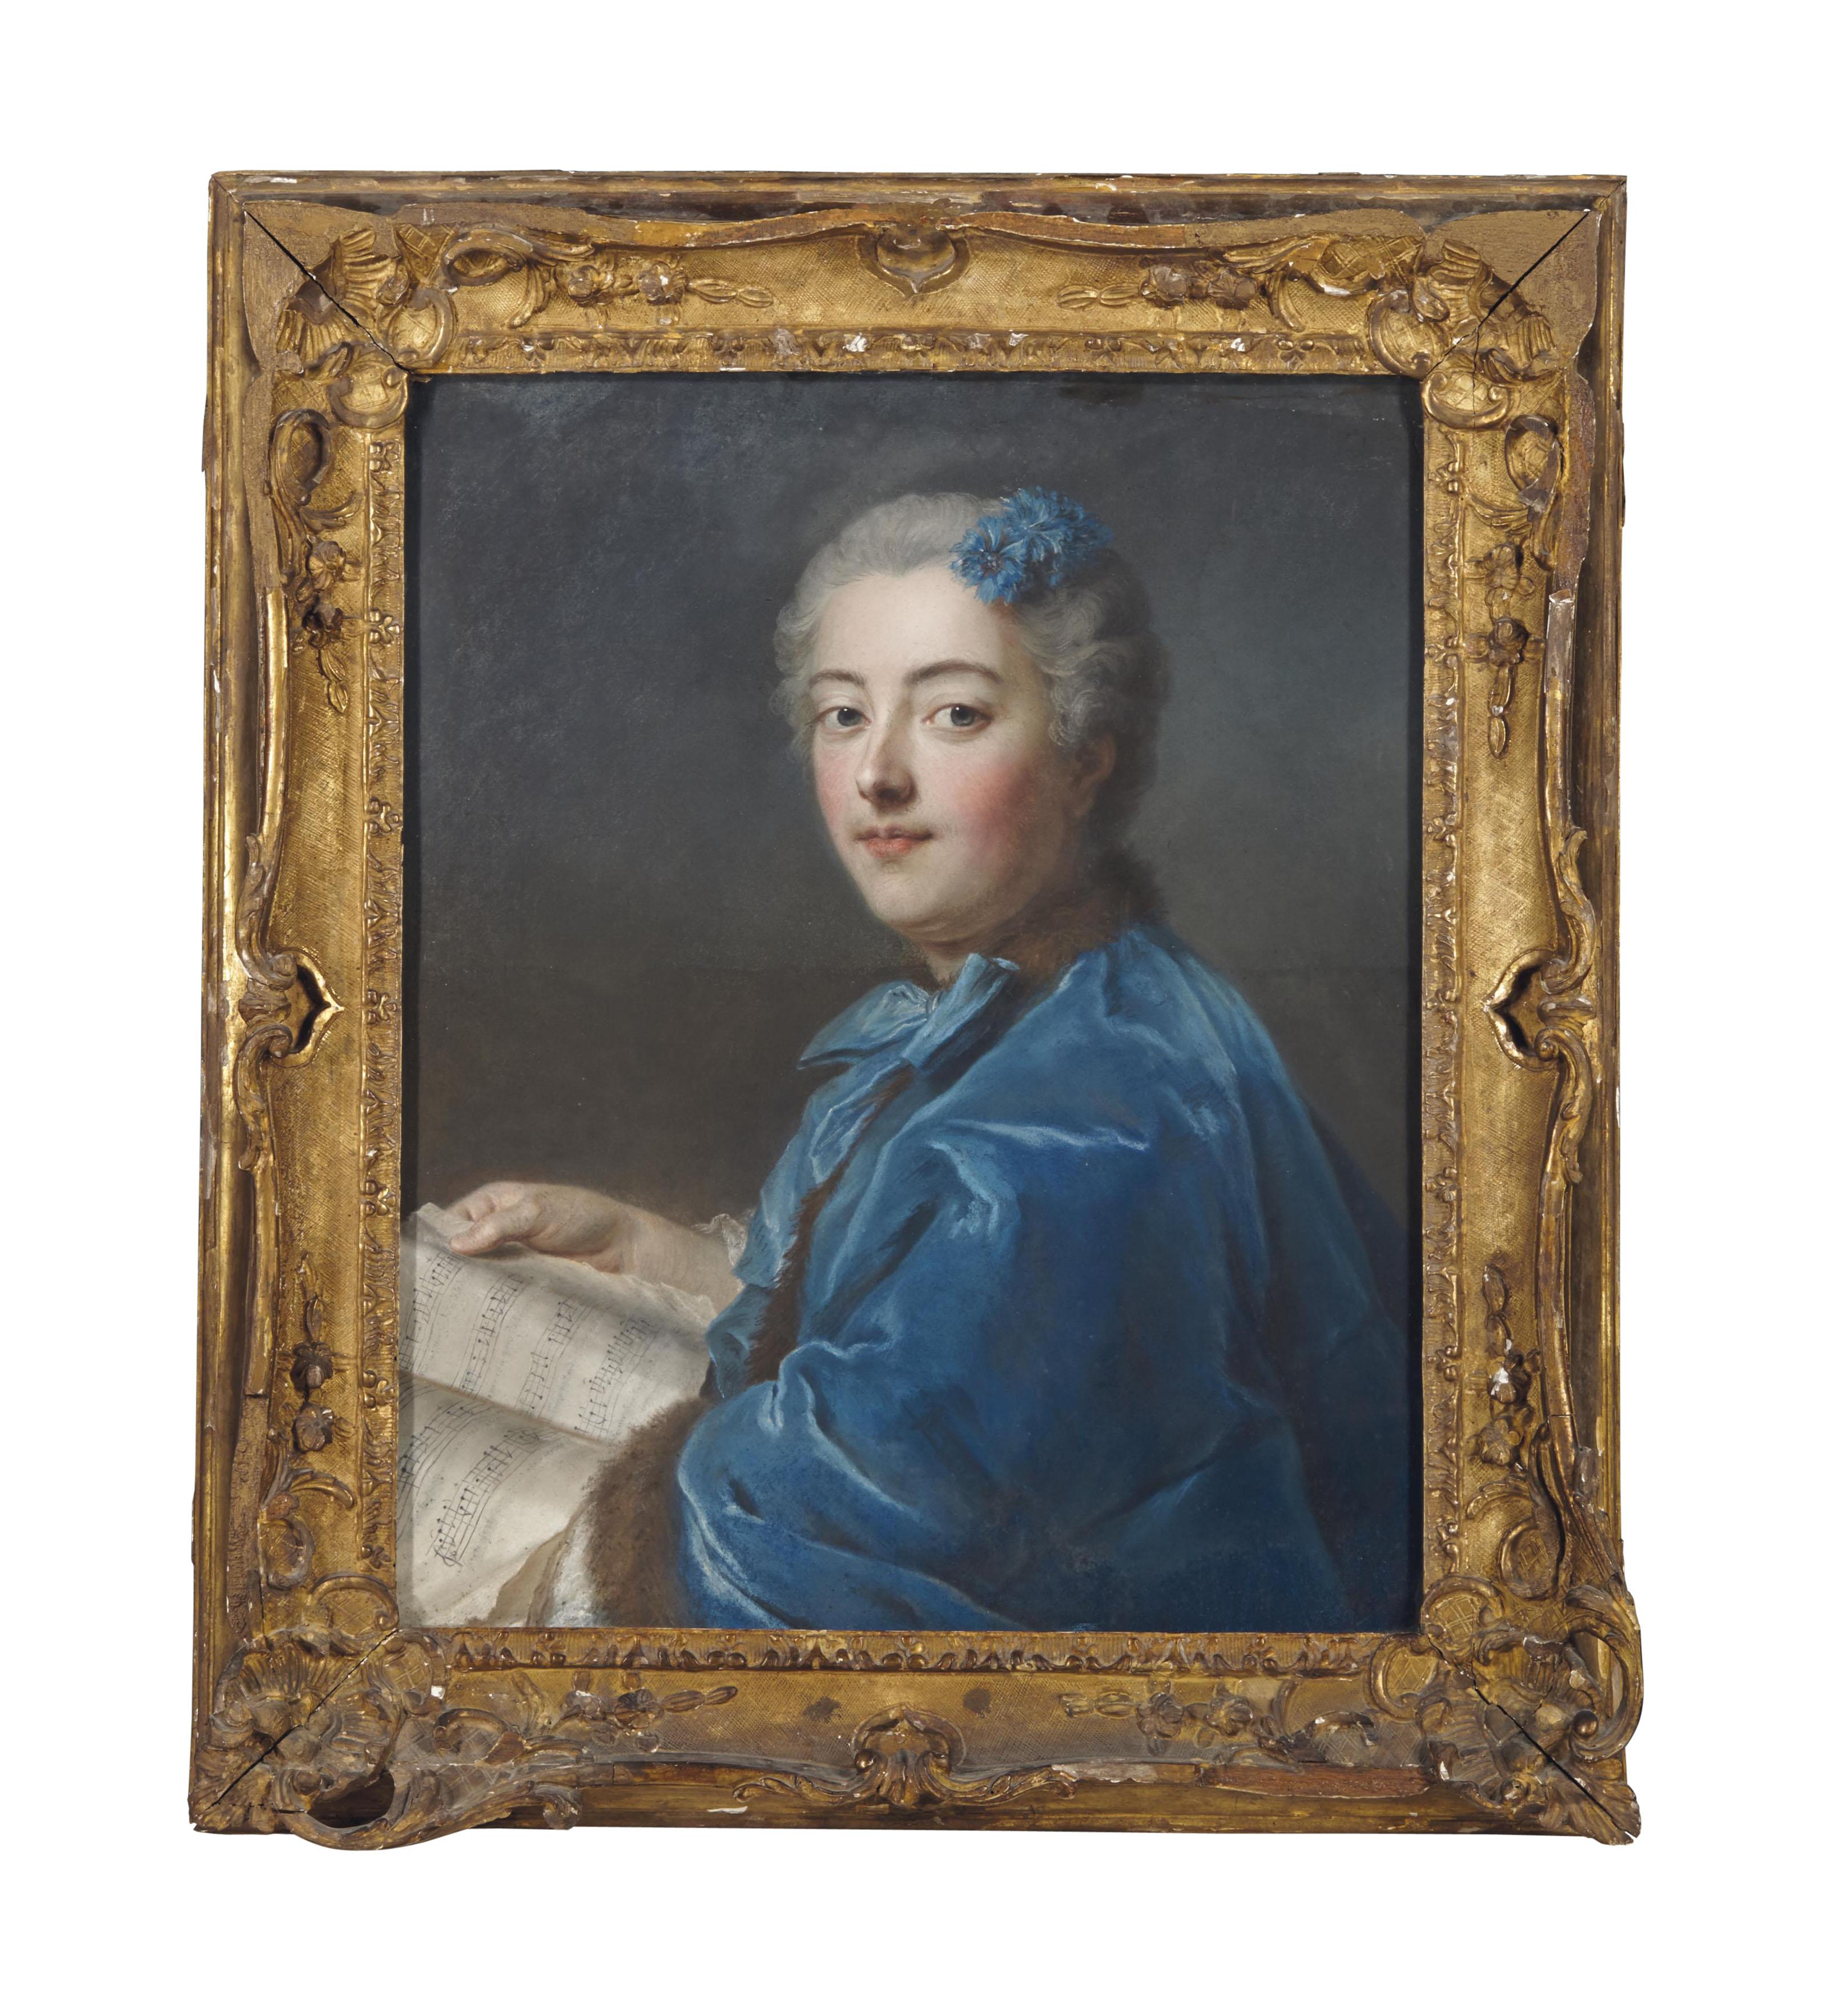 Portrait de la princesse de Rohan